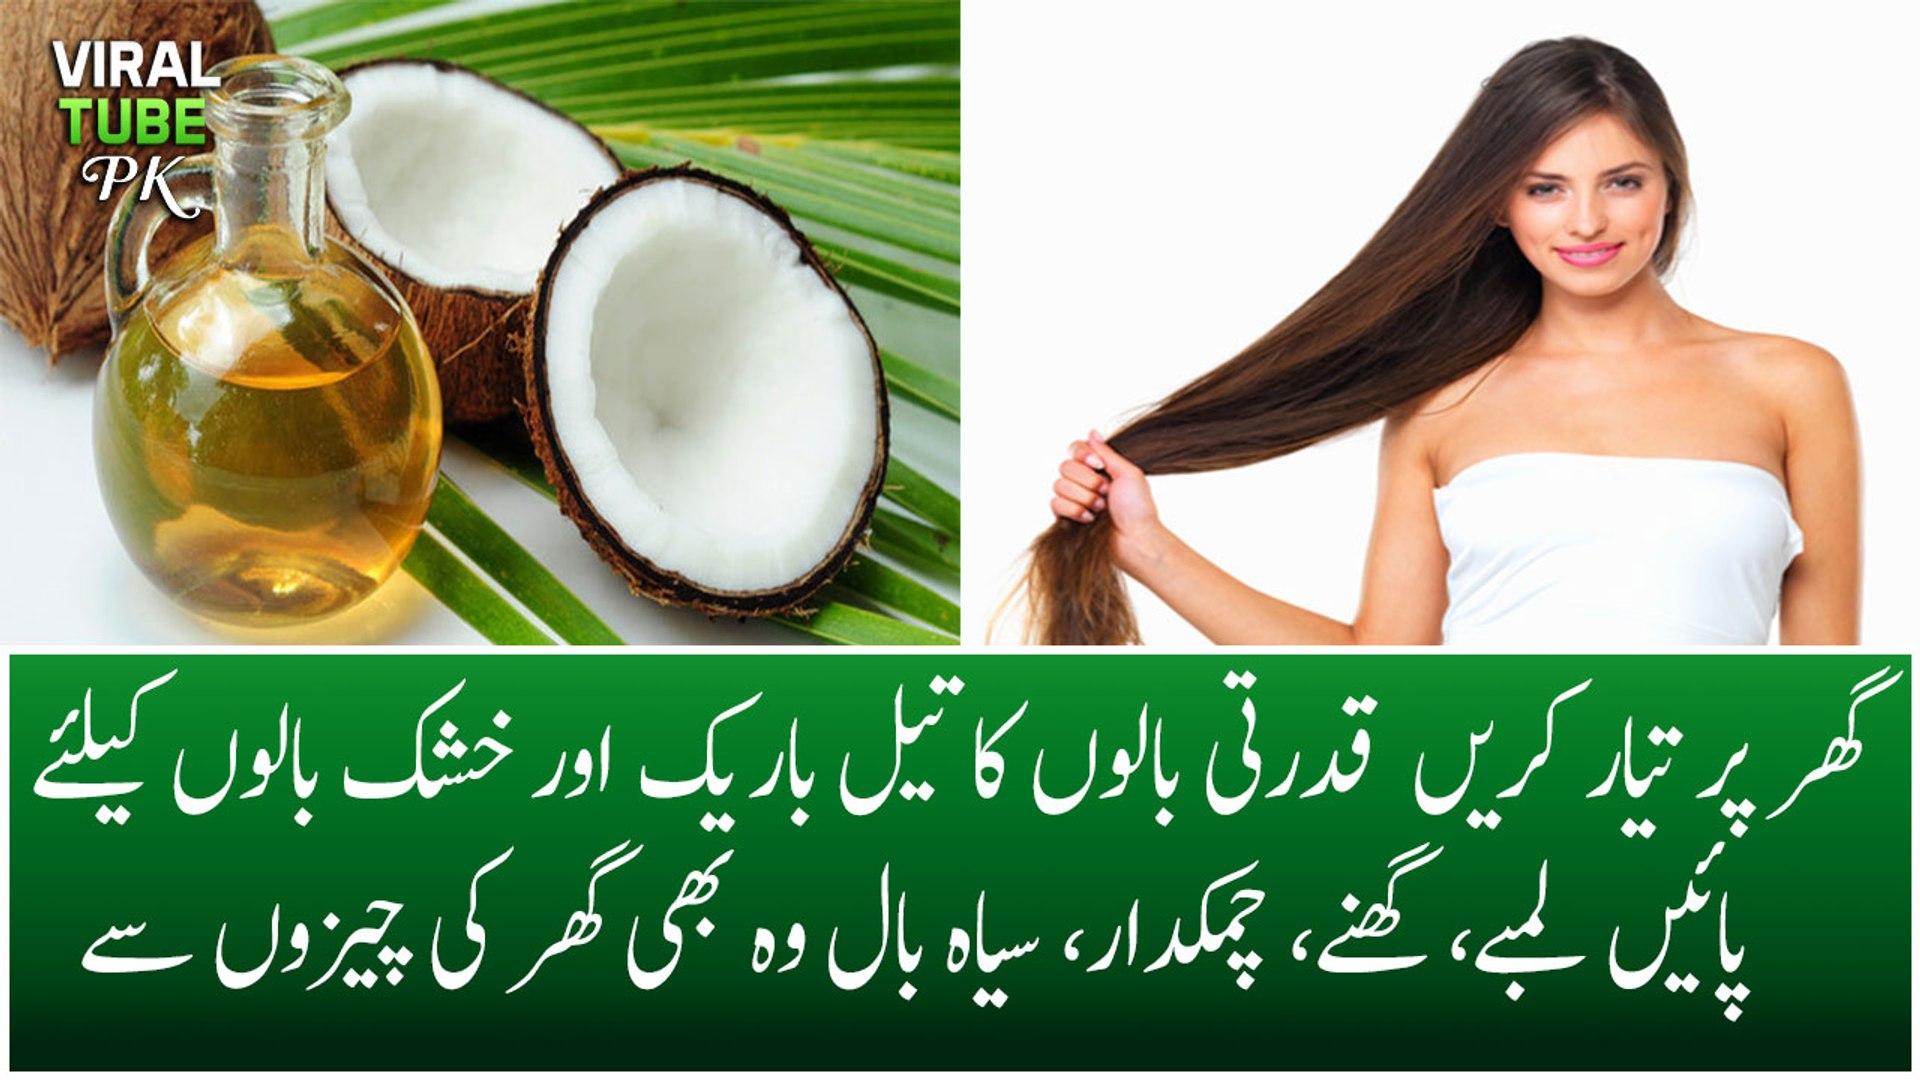 Homemade Natural Hair Oil For Dry Hairs 2016 Makes Hair Long & Shiny